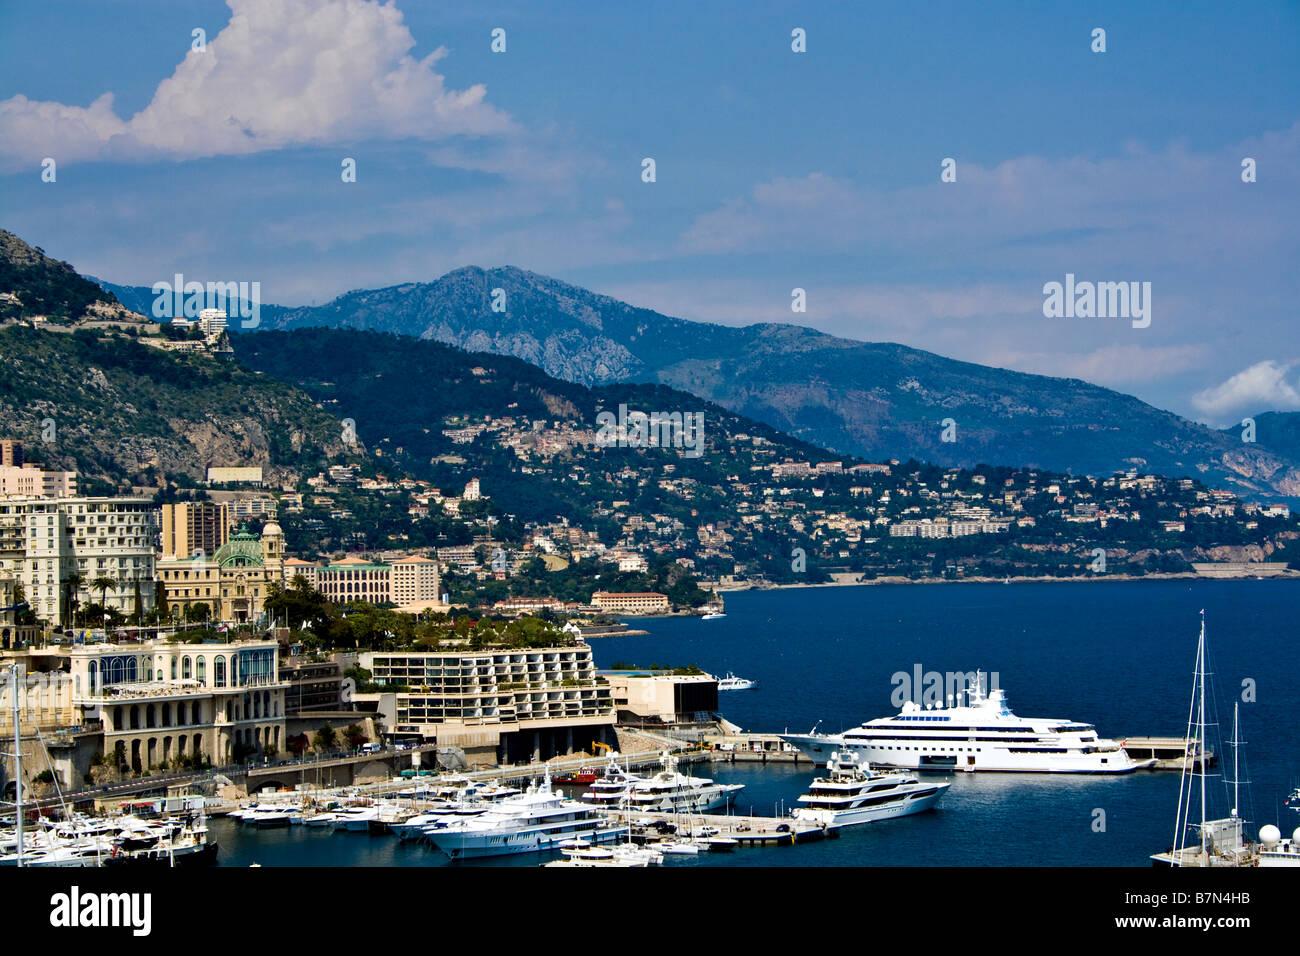 MONACO, MONTE CARLO. Monte Carlo city bay. - Stock Image